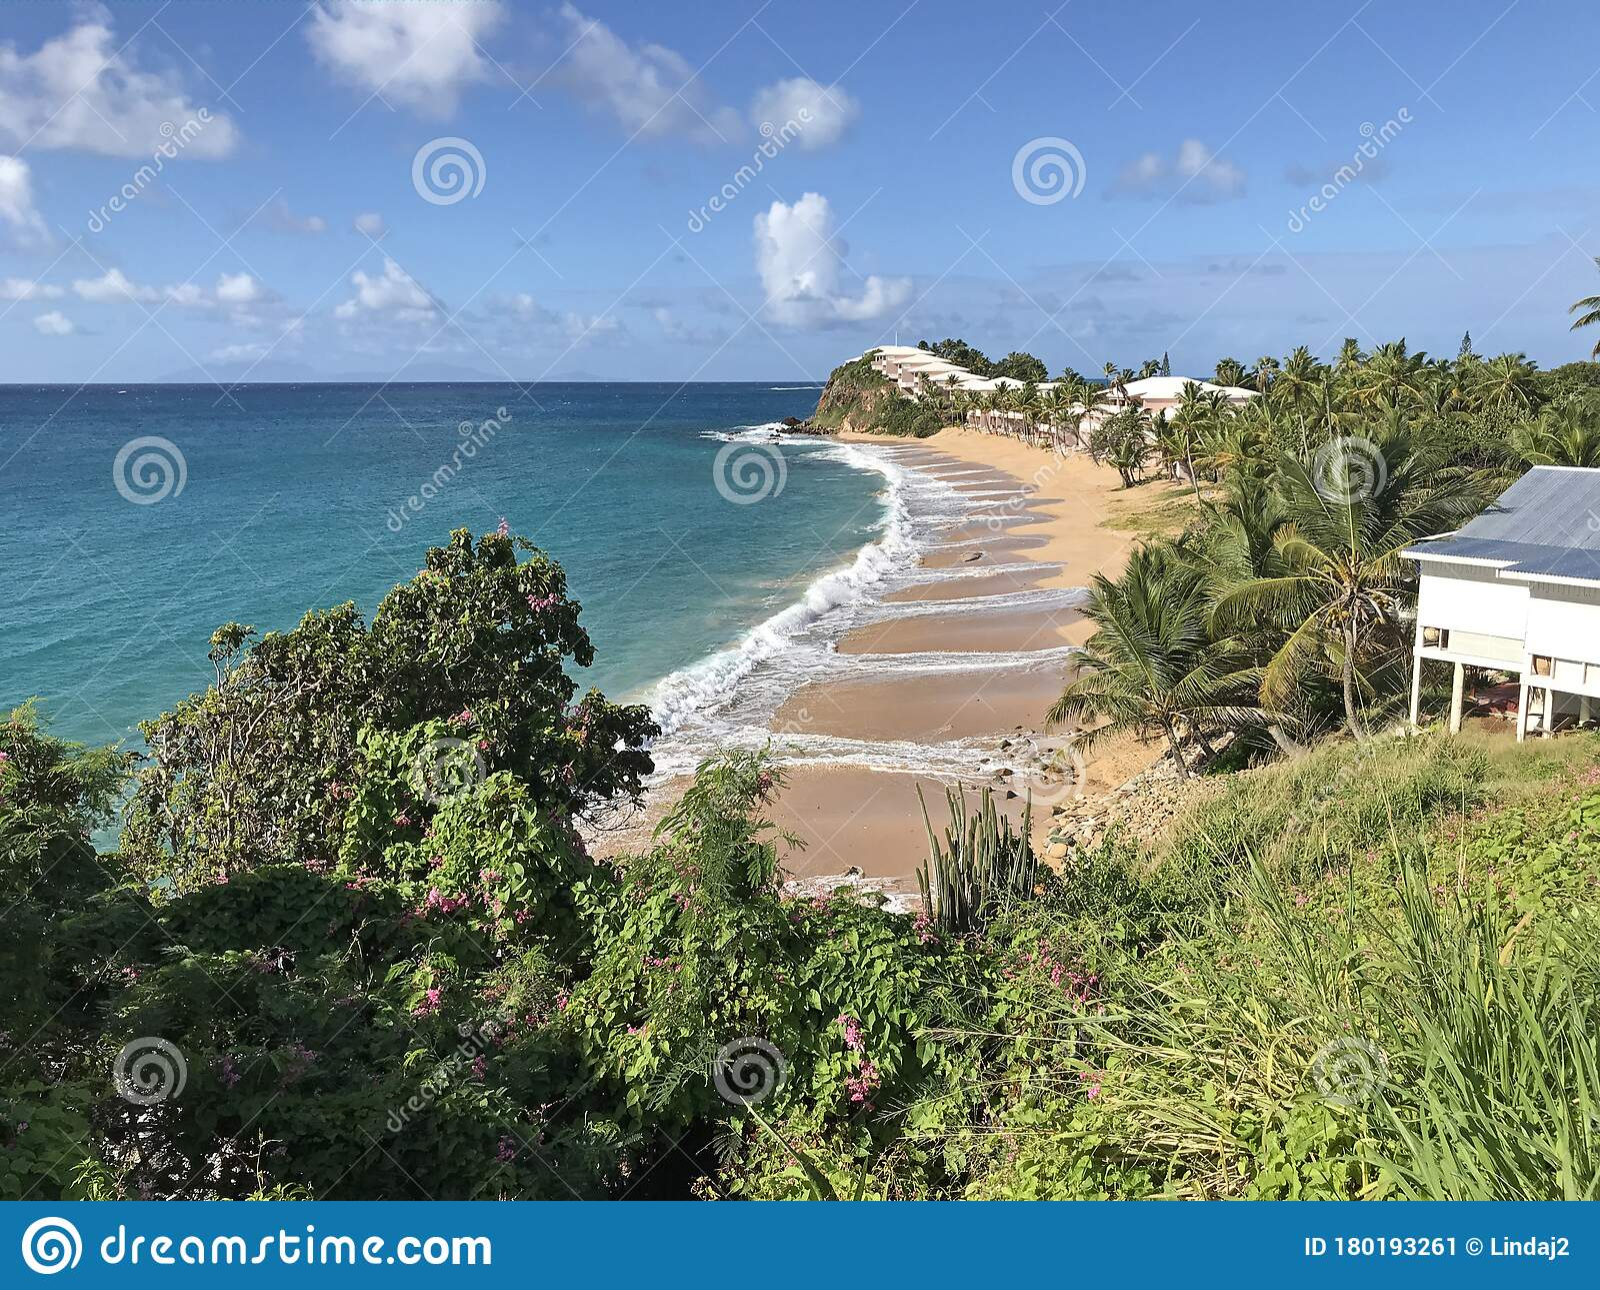 curtain bluff resort st mary antigua and barbuda stock image image of deserted beach 180193261